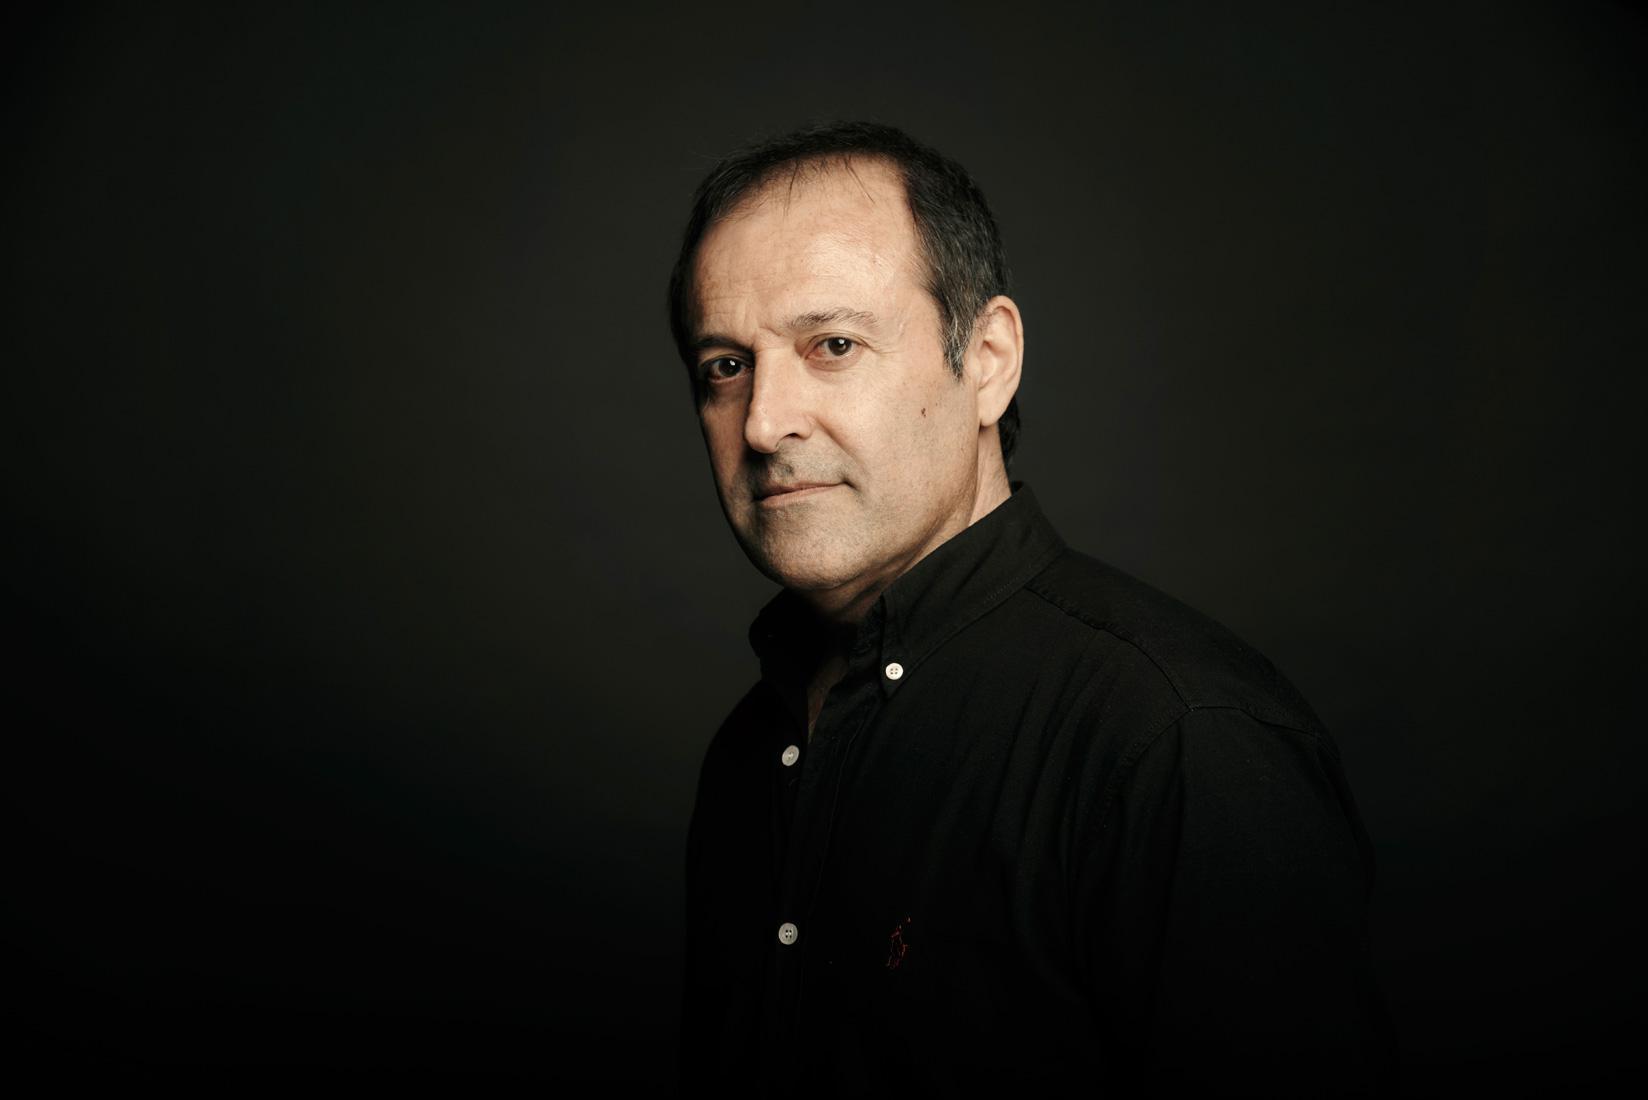 Enric Pellicer Falcó